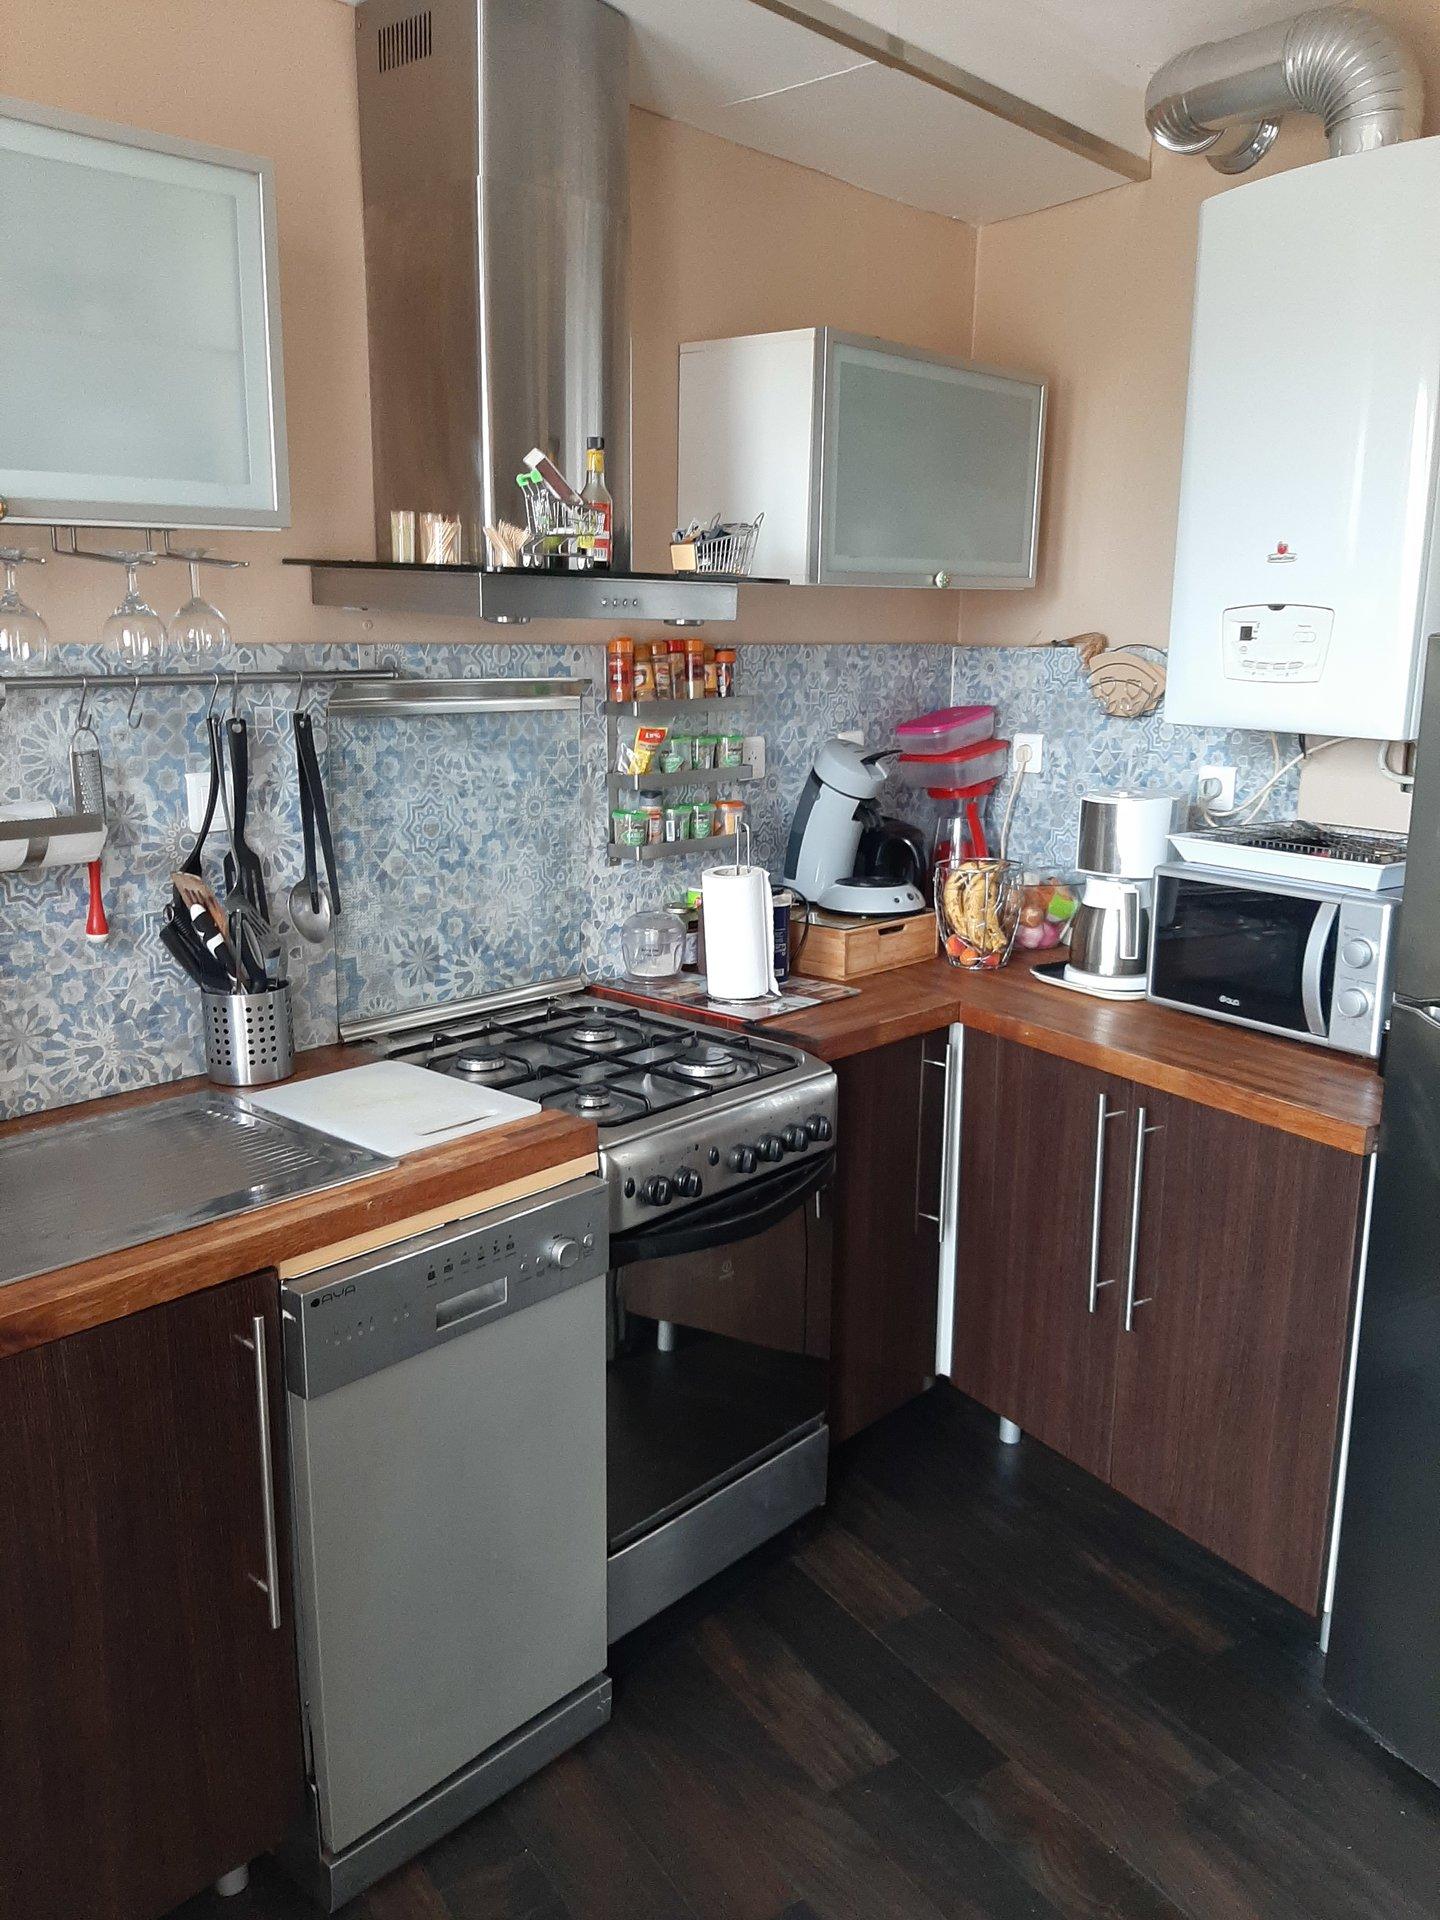 6001SCA - Appartement T3 - CUSSET